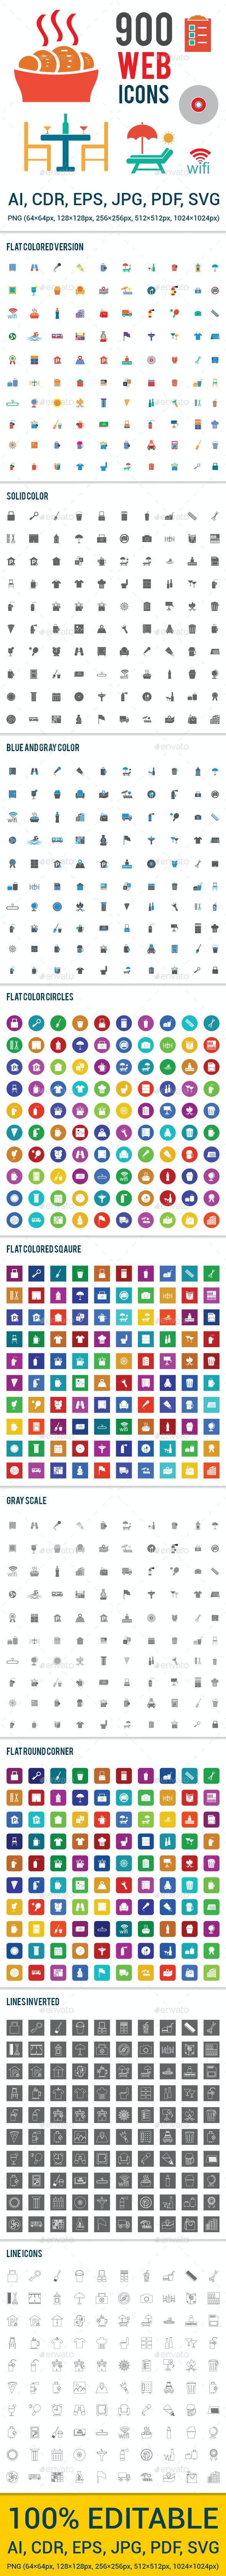 900 Web Icons - Web Icons